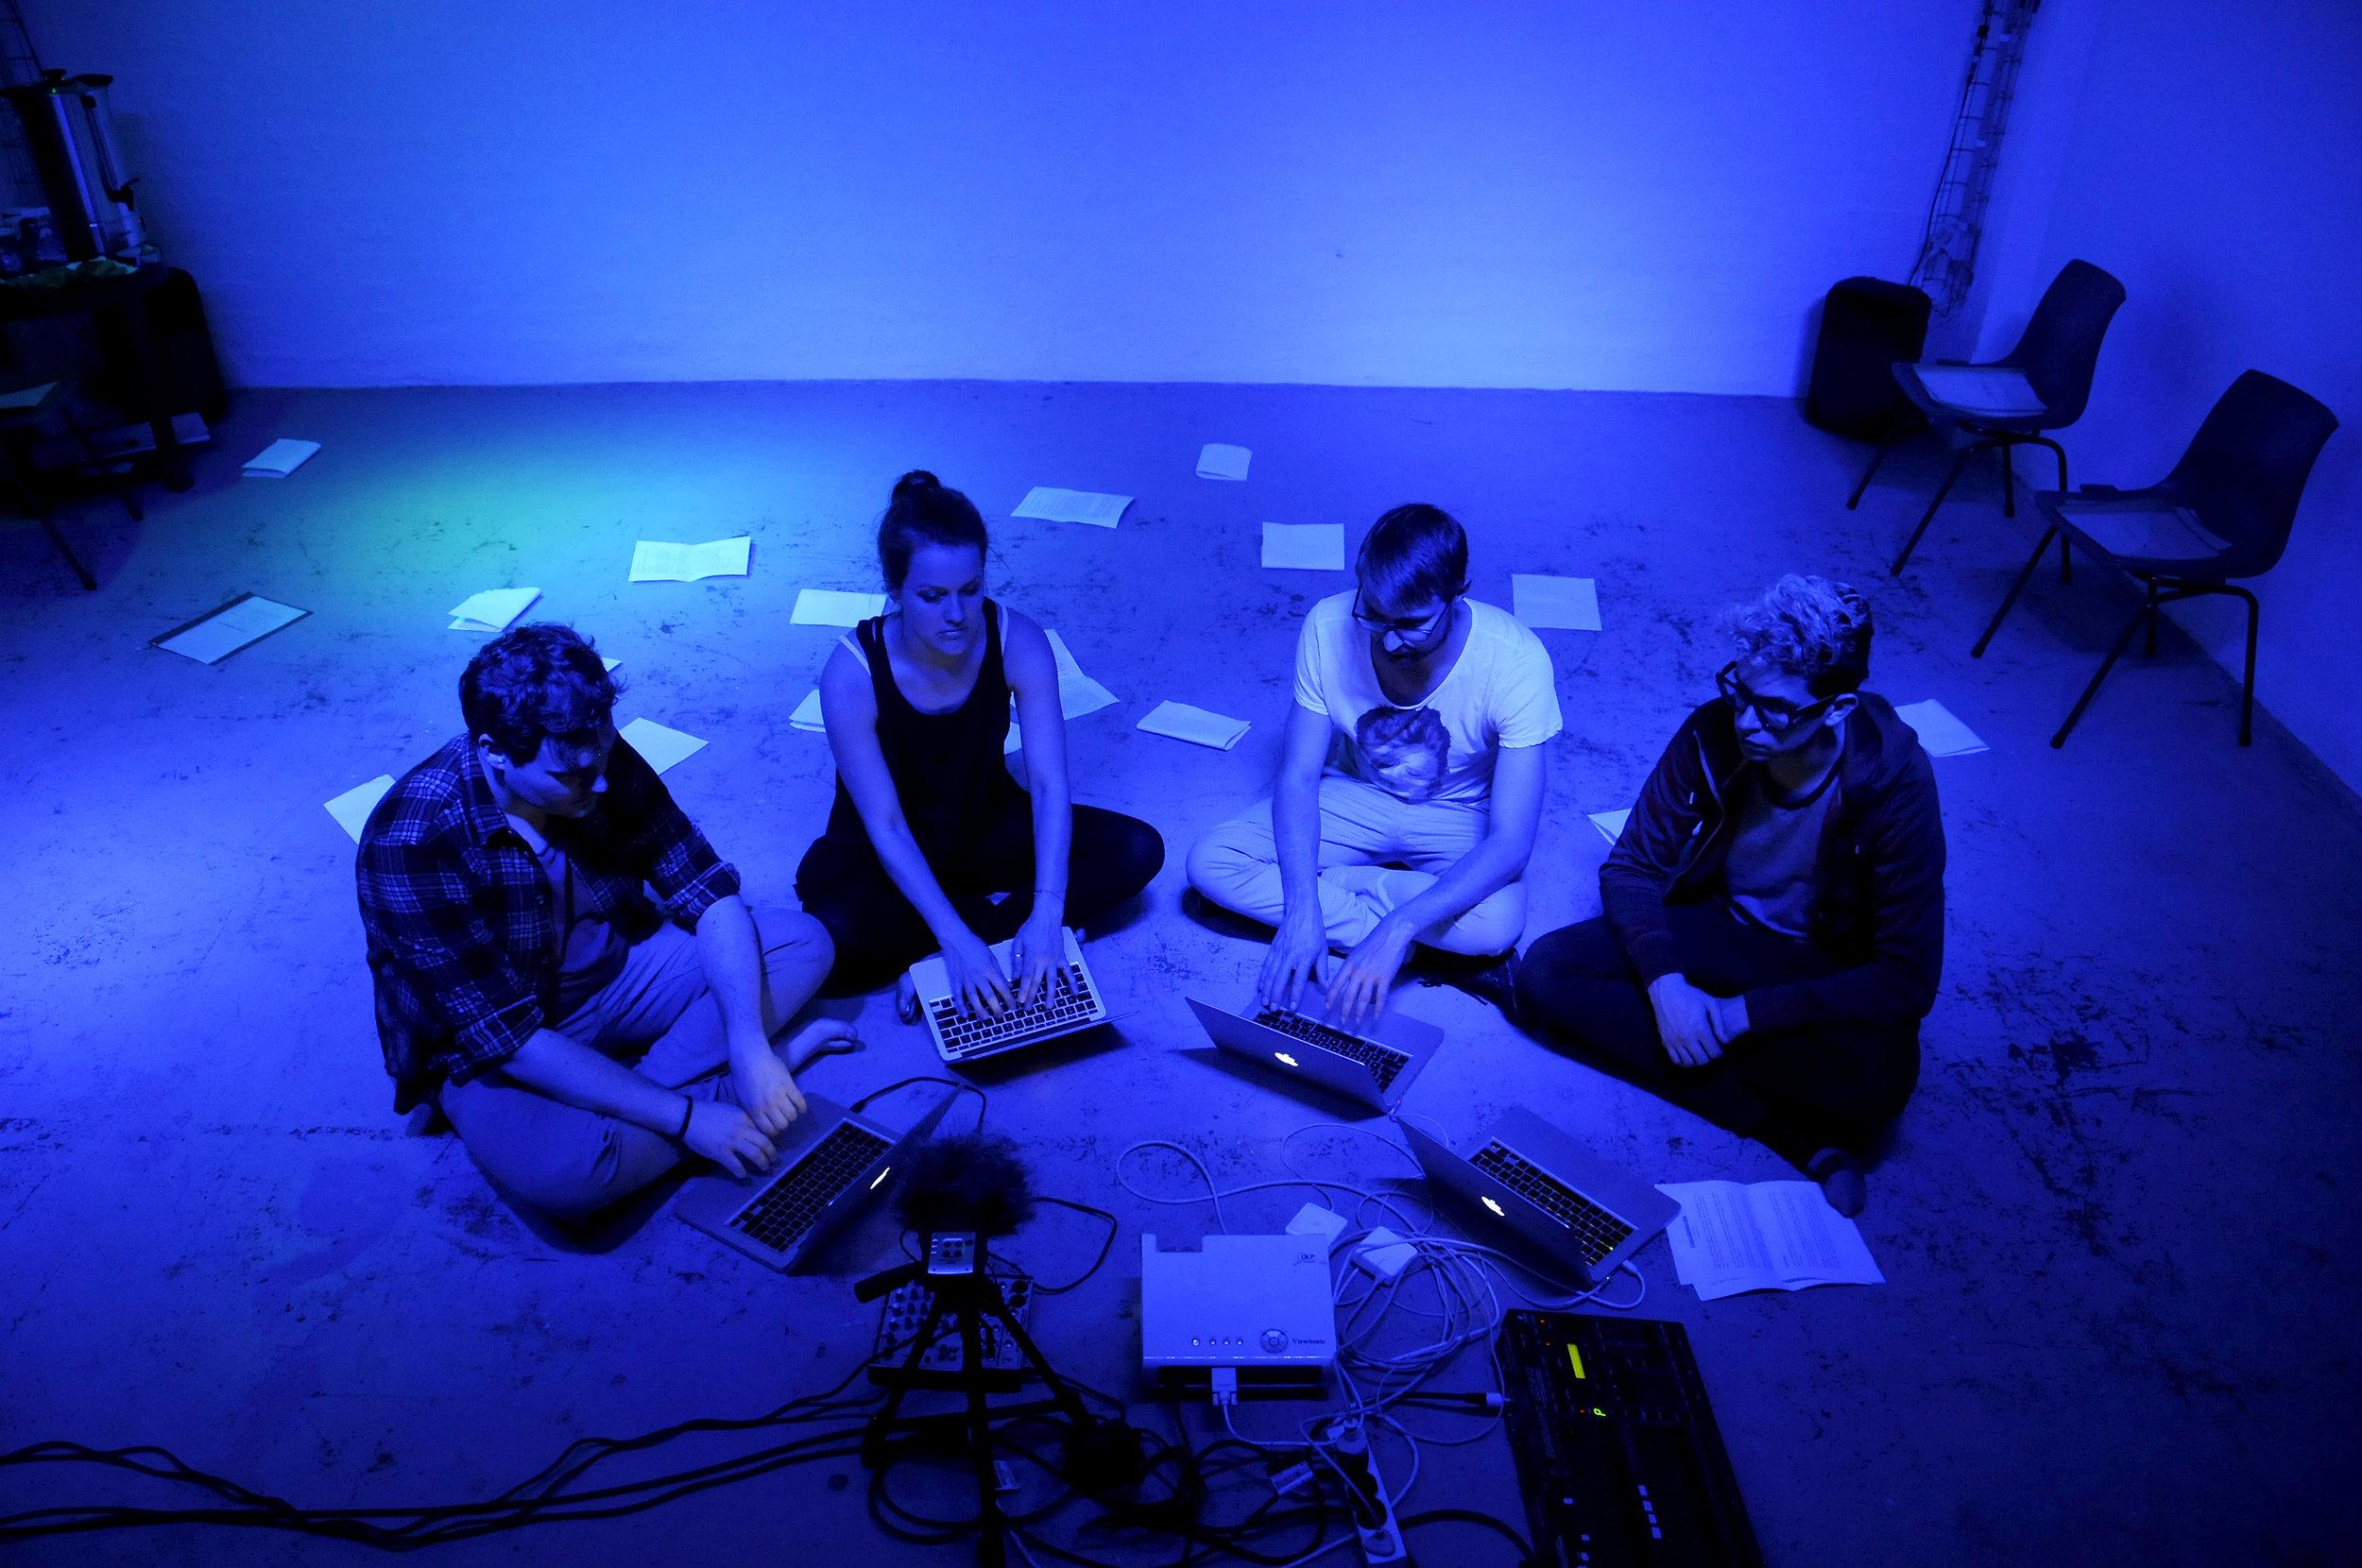 Patrick Howard, Jacqueline Marriott, Victor Kalka, and Ryan Devlin in  Götterdämmerung , 2016.